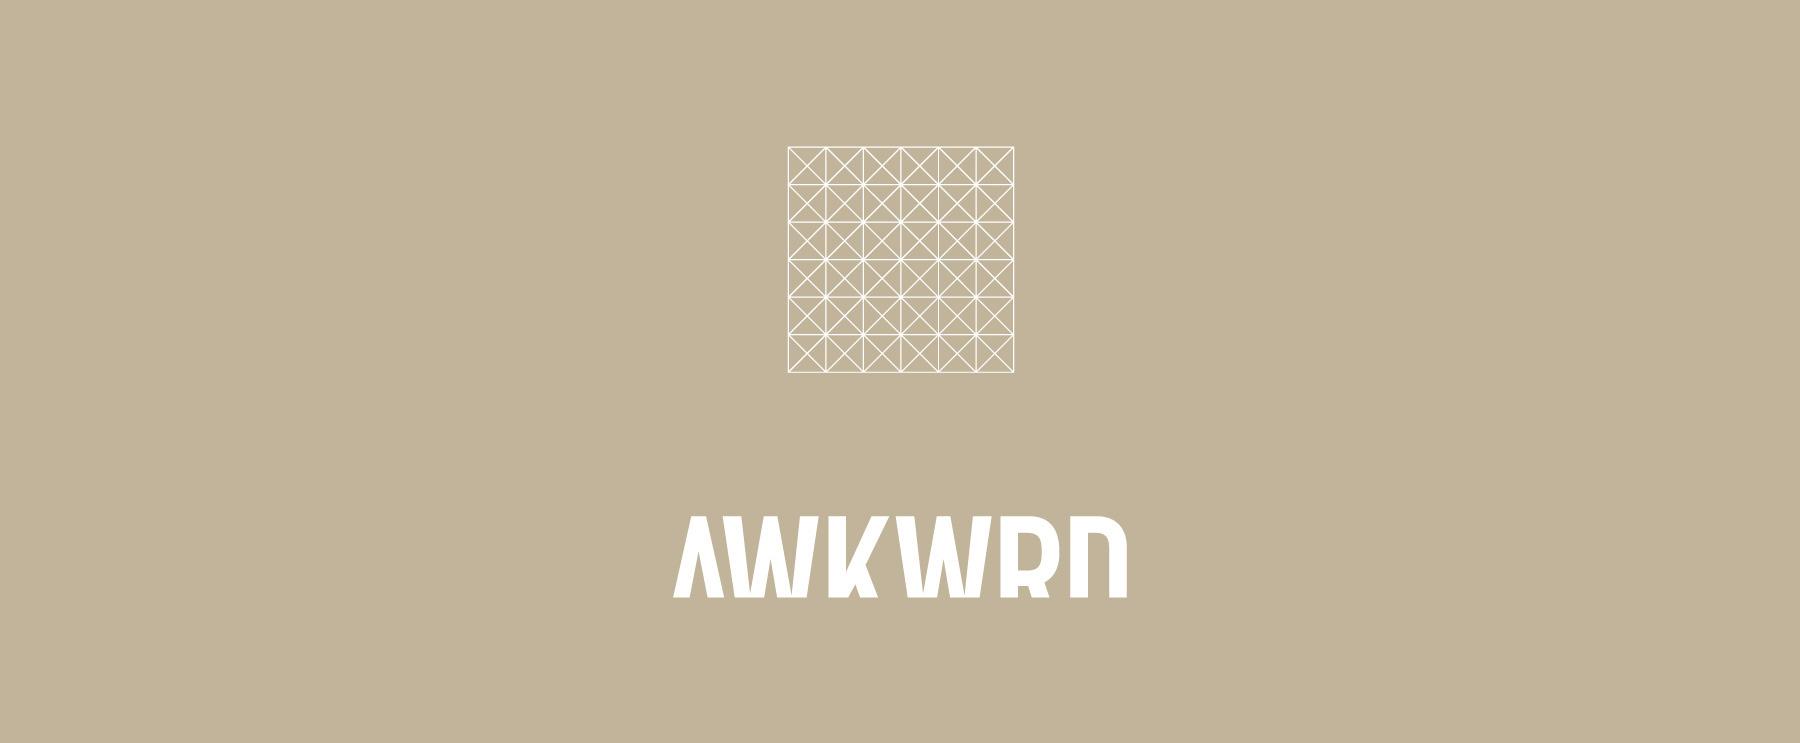 Awkwrd — Berger & Föhr — Design & Art Direction